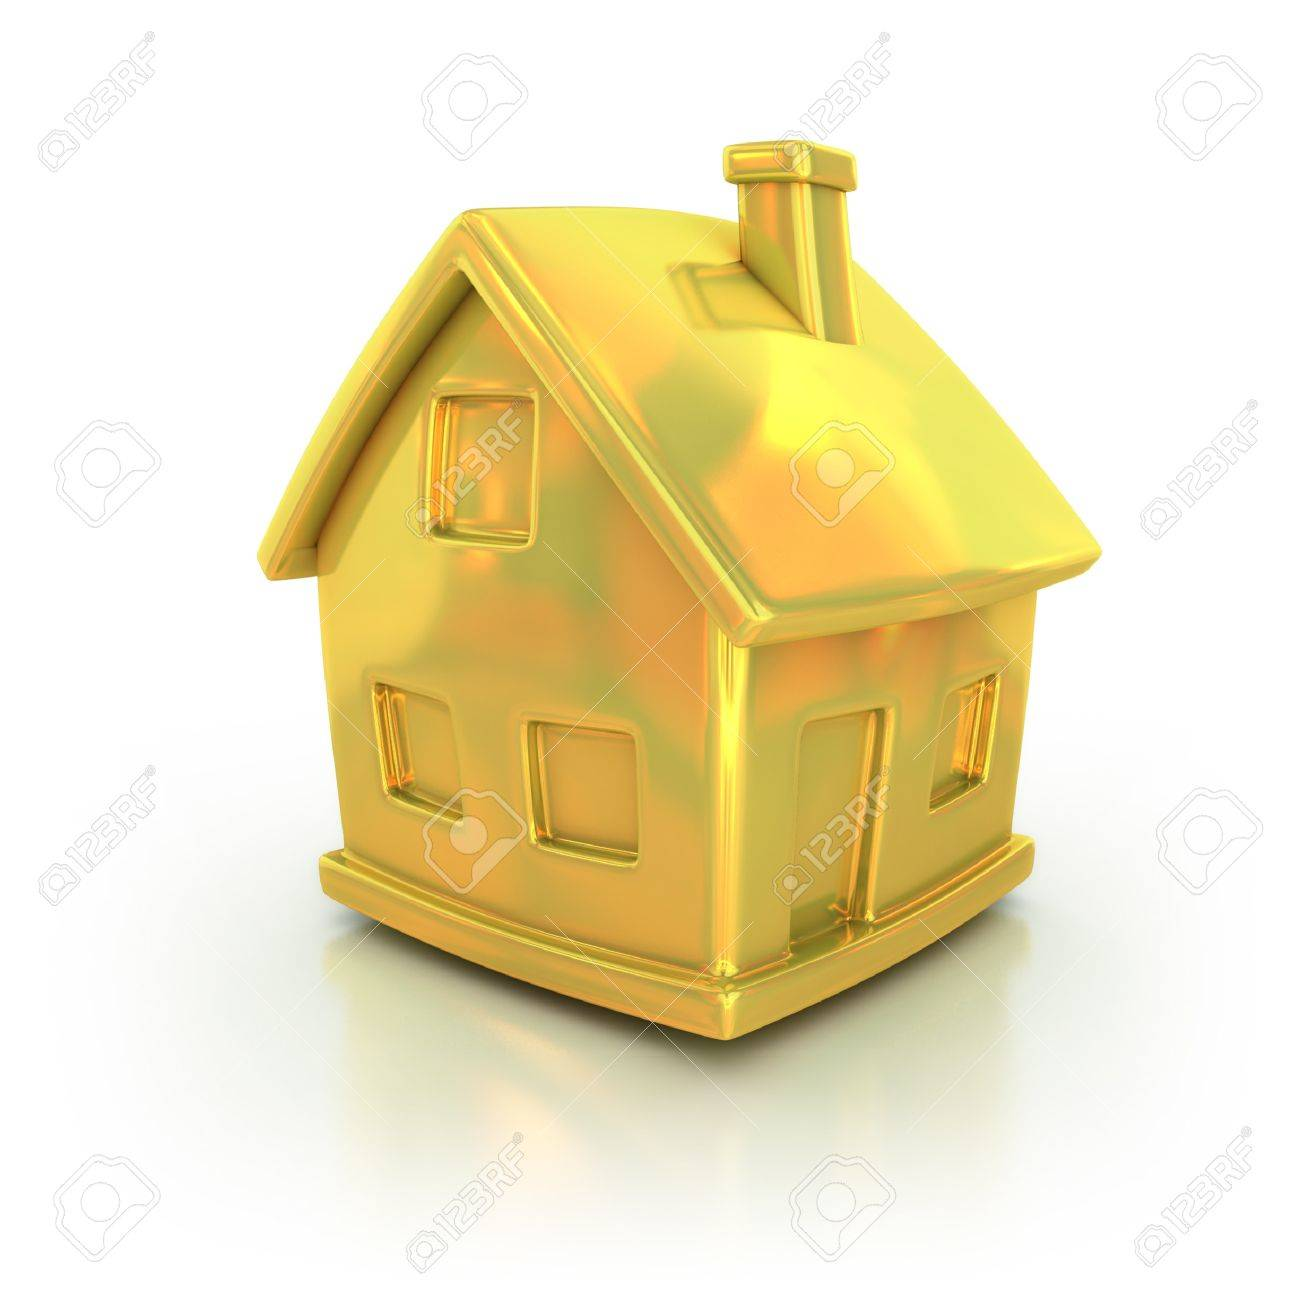 Golden House 3d Icon Stock Photo   12557733